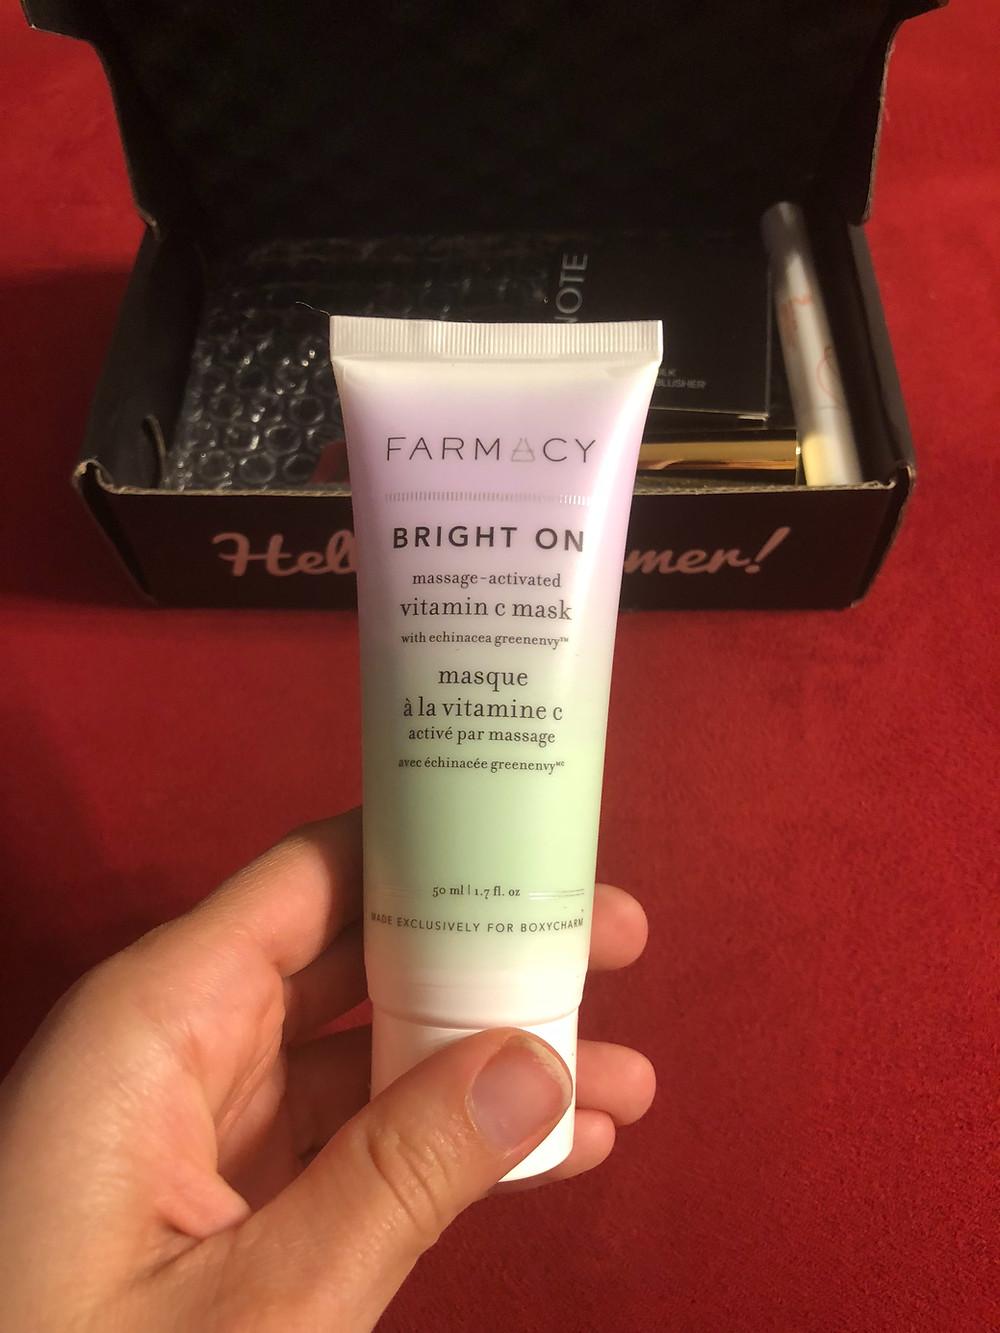 Farmacy Bright On Mask Boxycharm